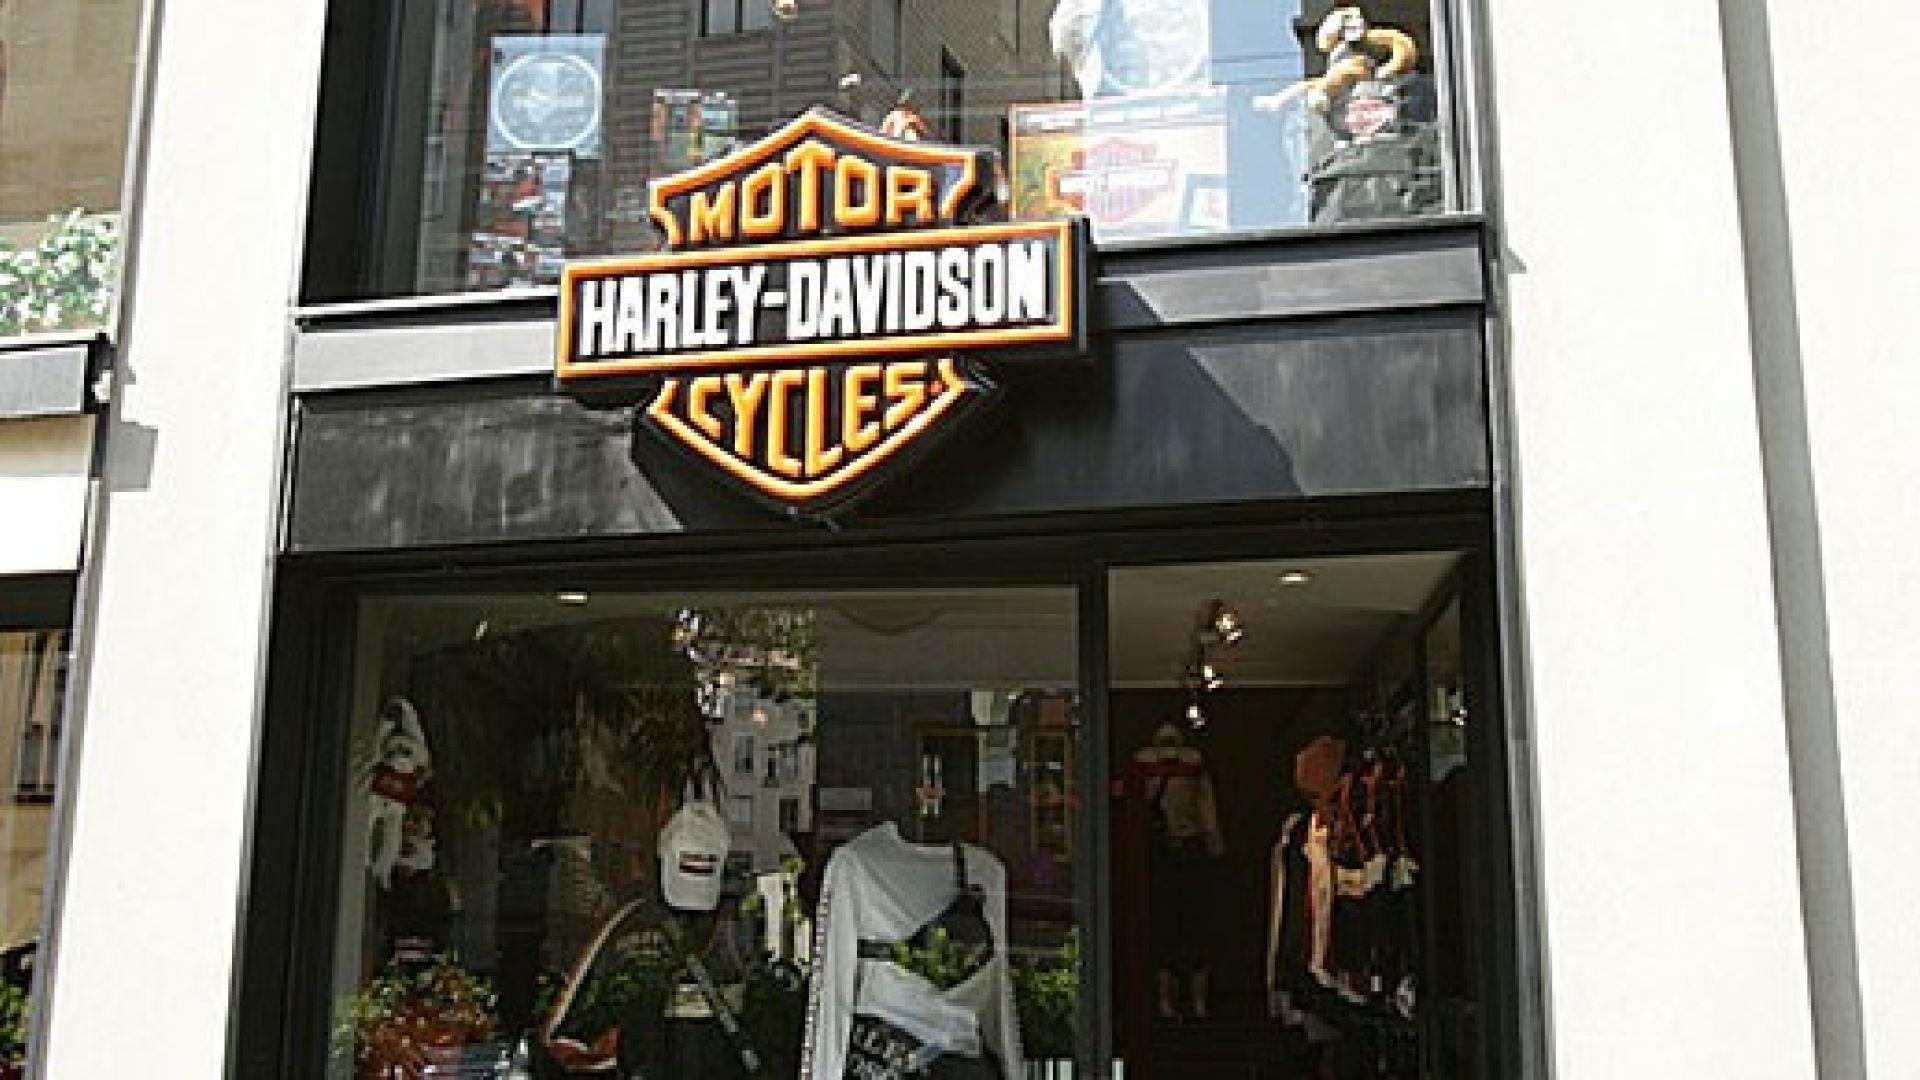 harley davidson uno store monomarca anche a milano motorbox. Black Bedroom Furniture Sets. Home Design Ideas